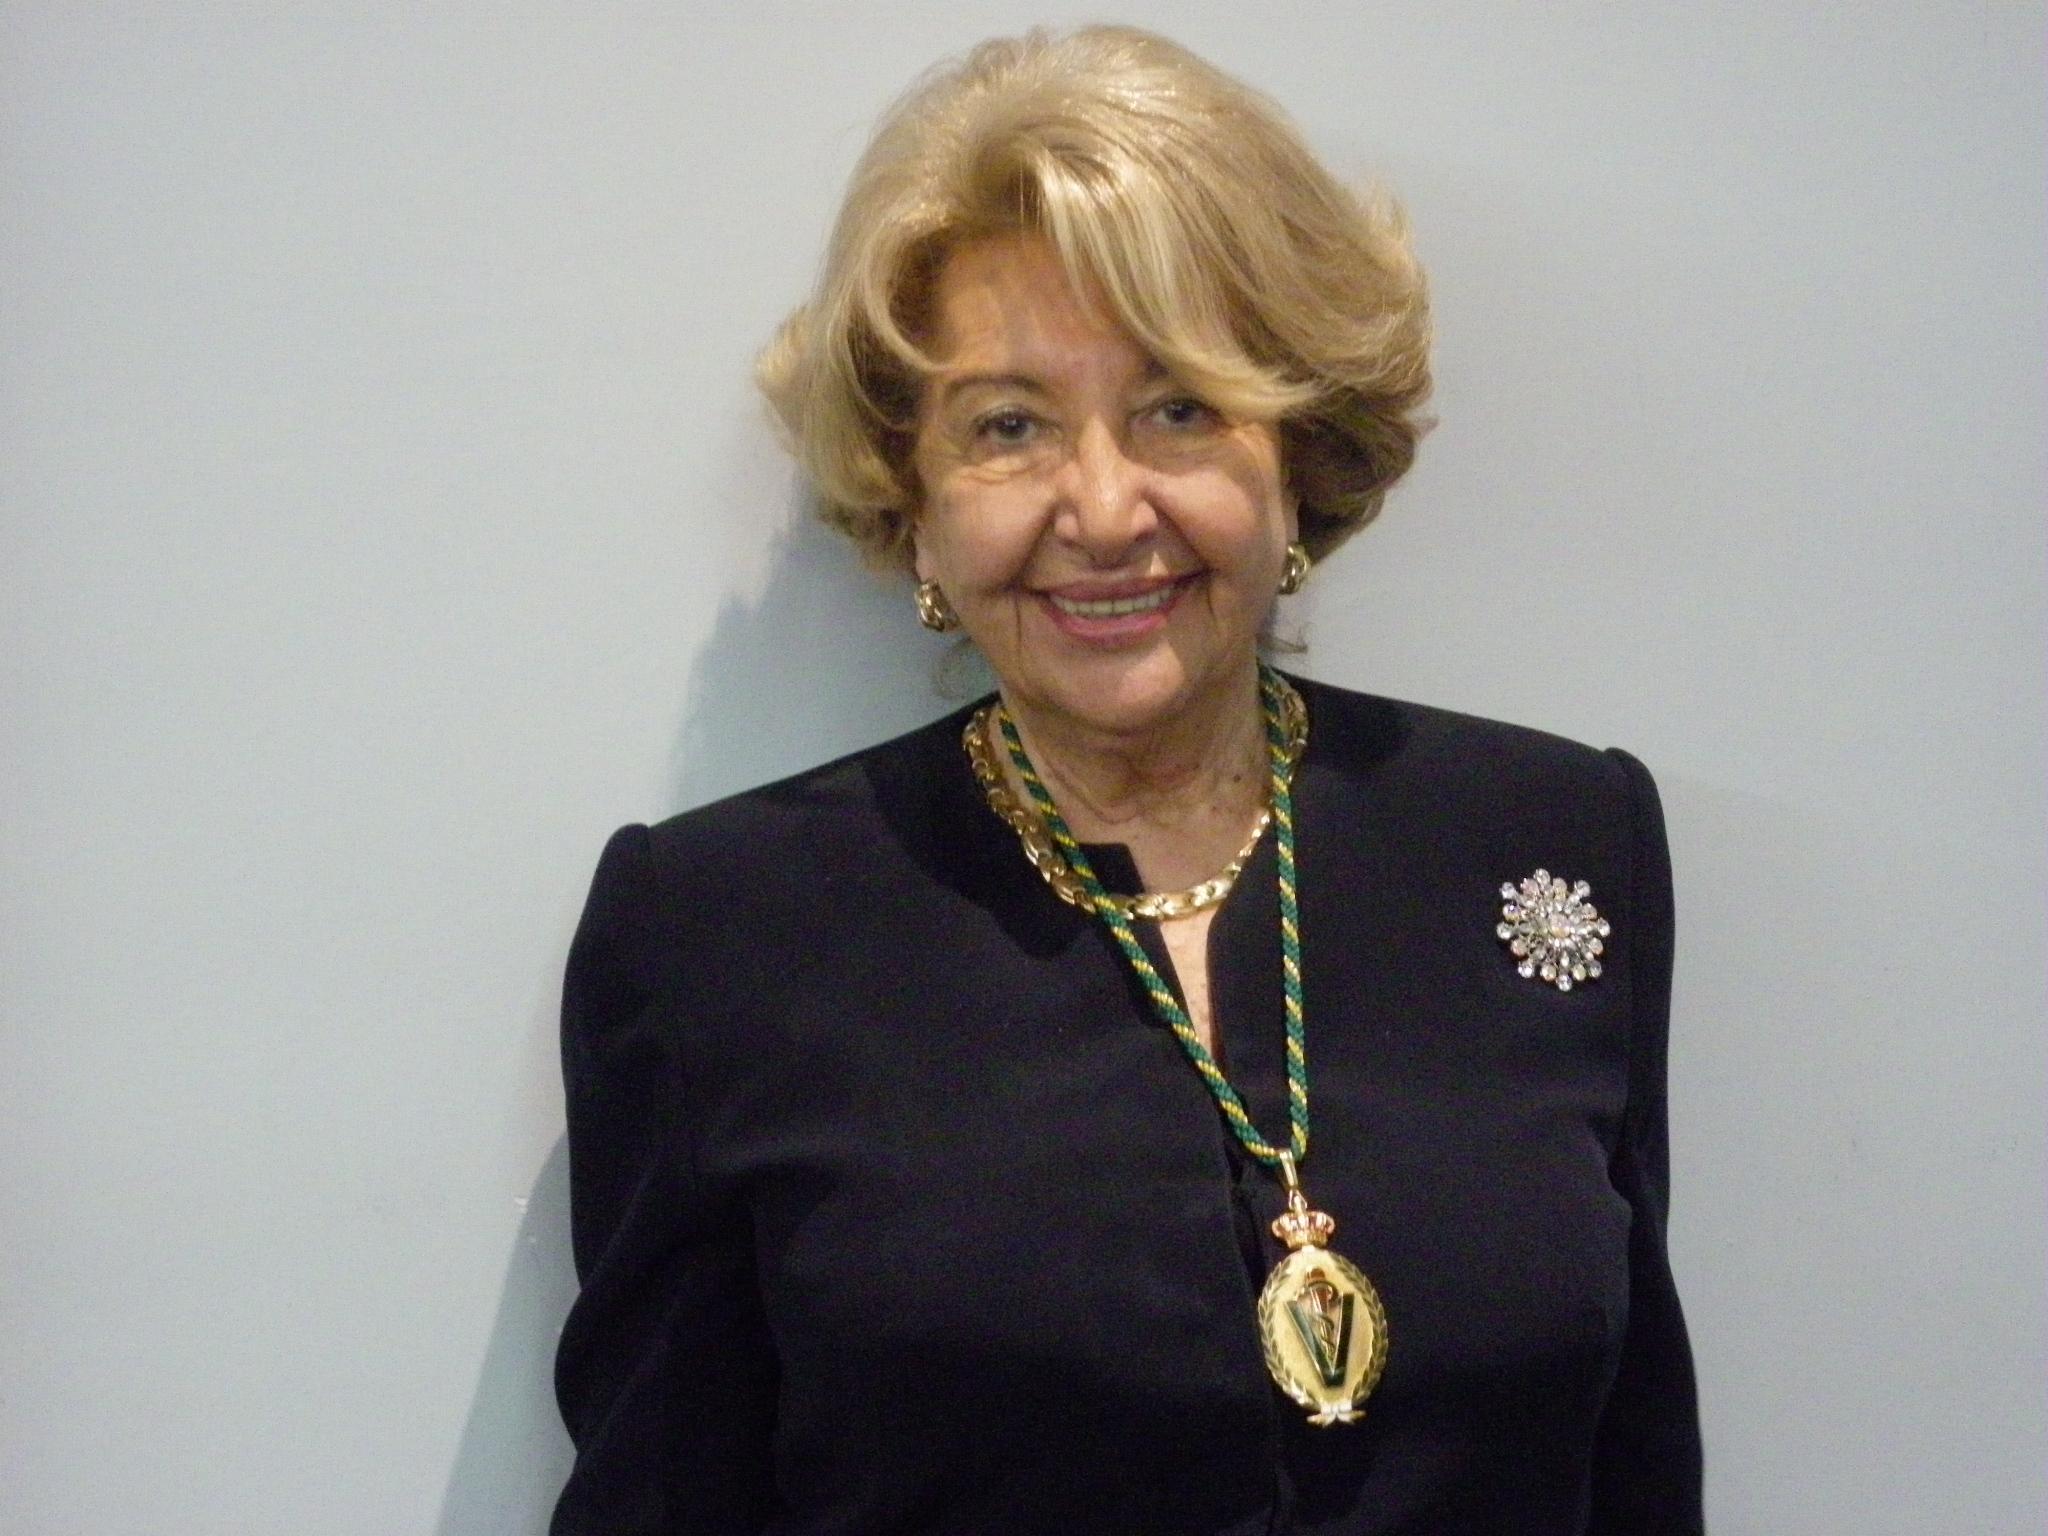 Excma. Sra. Dña. Magdalena Gálvez Morros